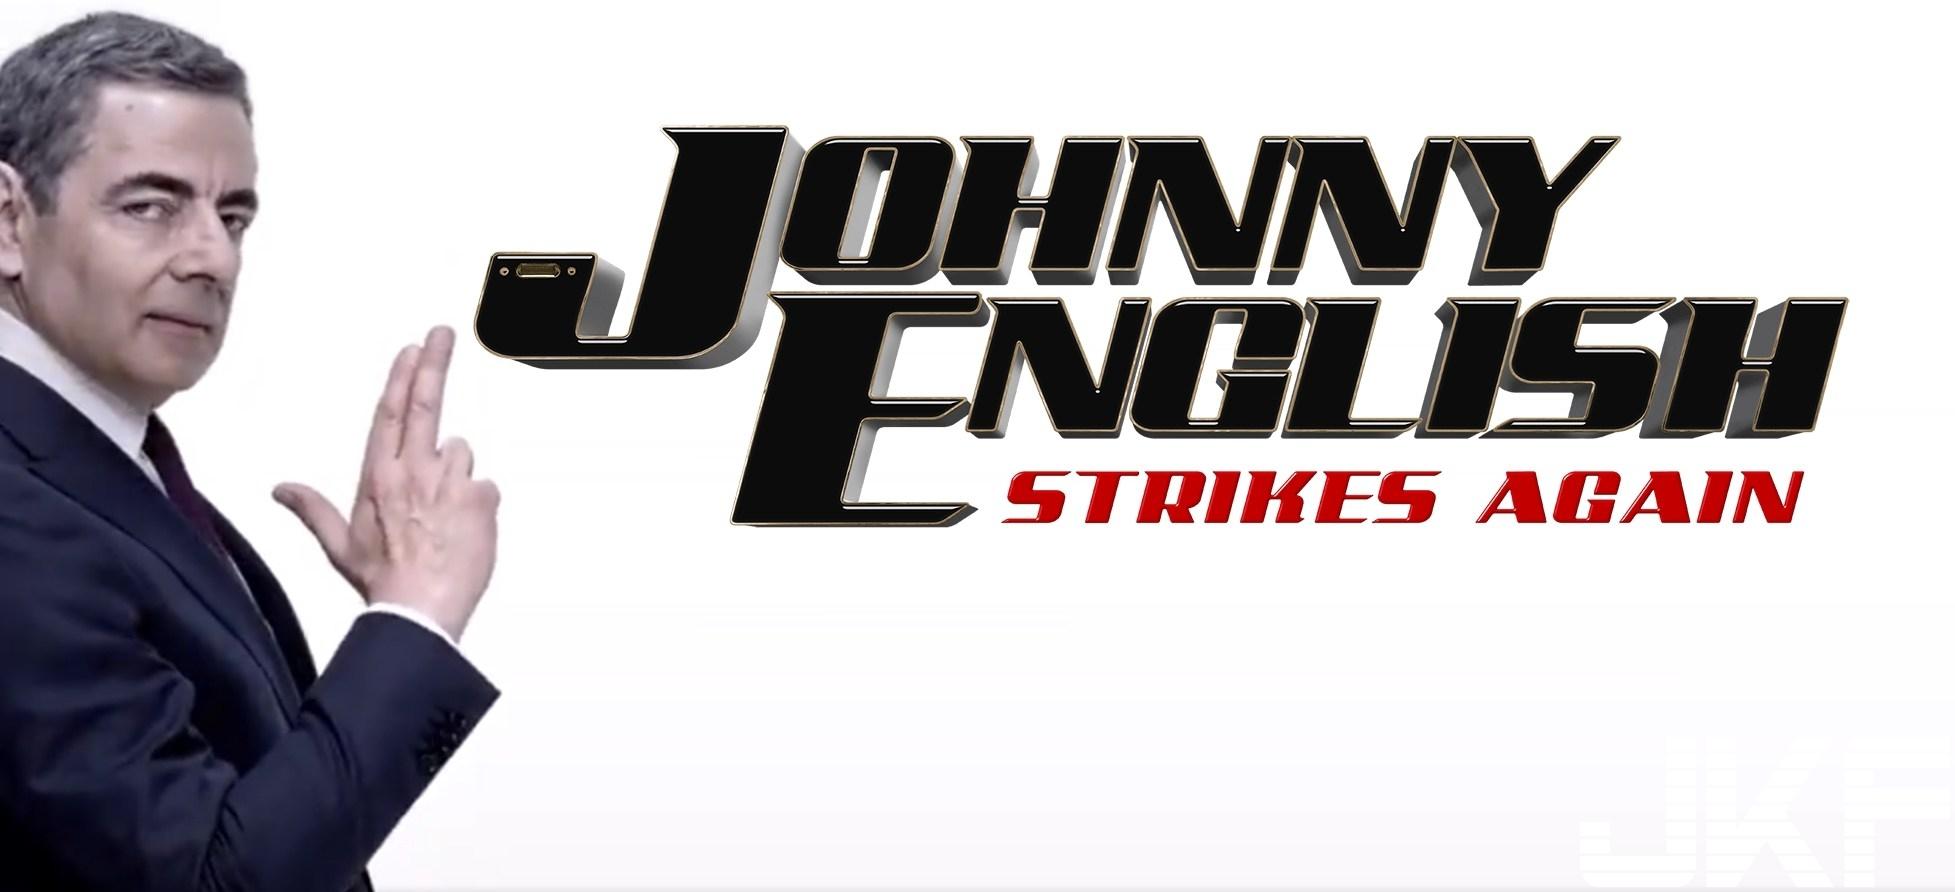 Johnny-English-3-Movie-Johnny-English-Strikes-Again.jpg